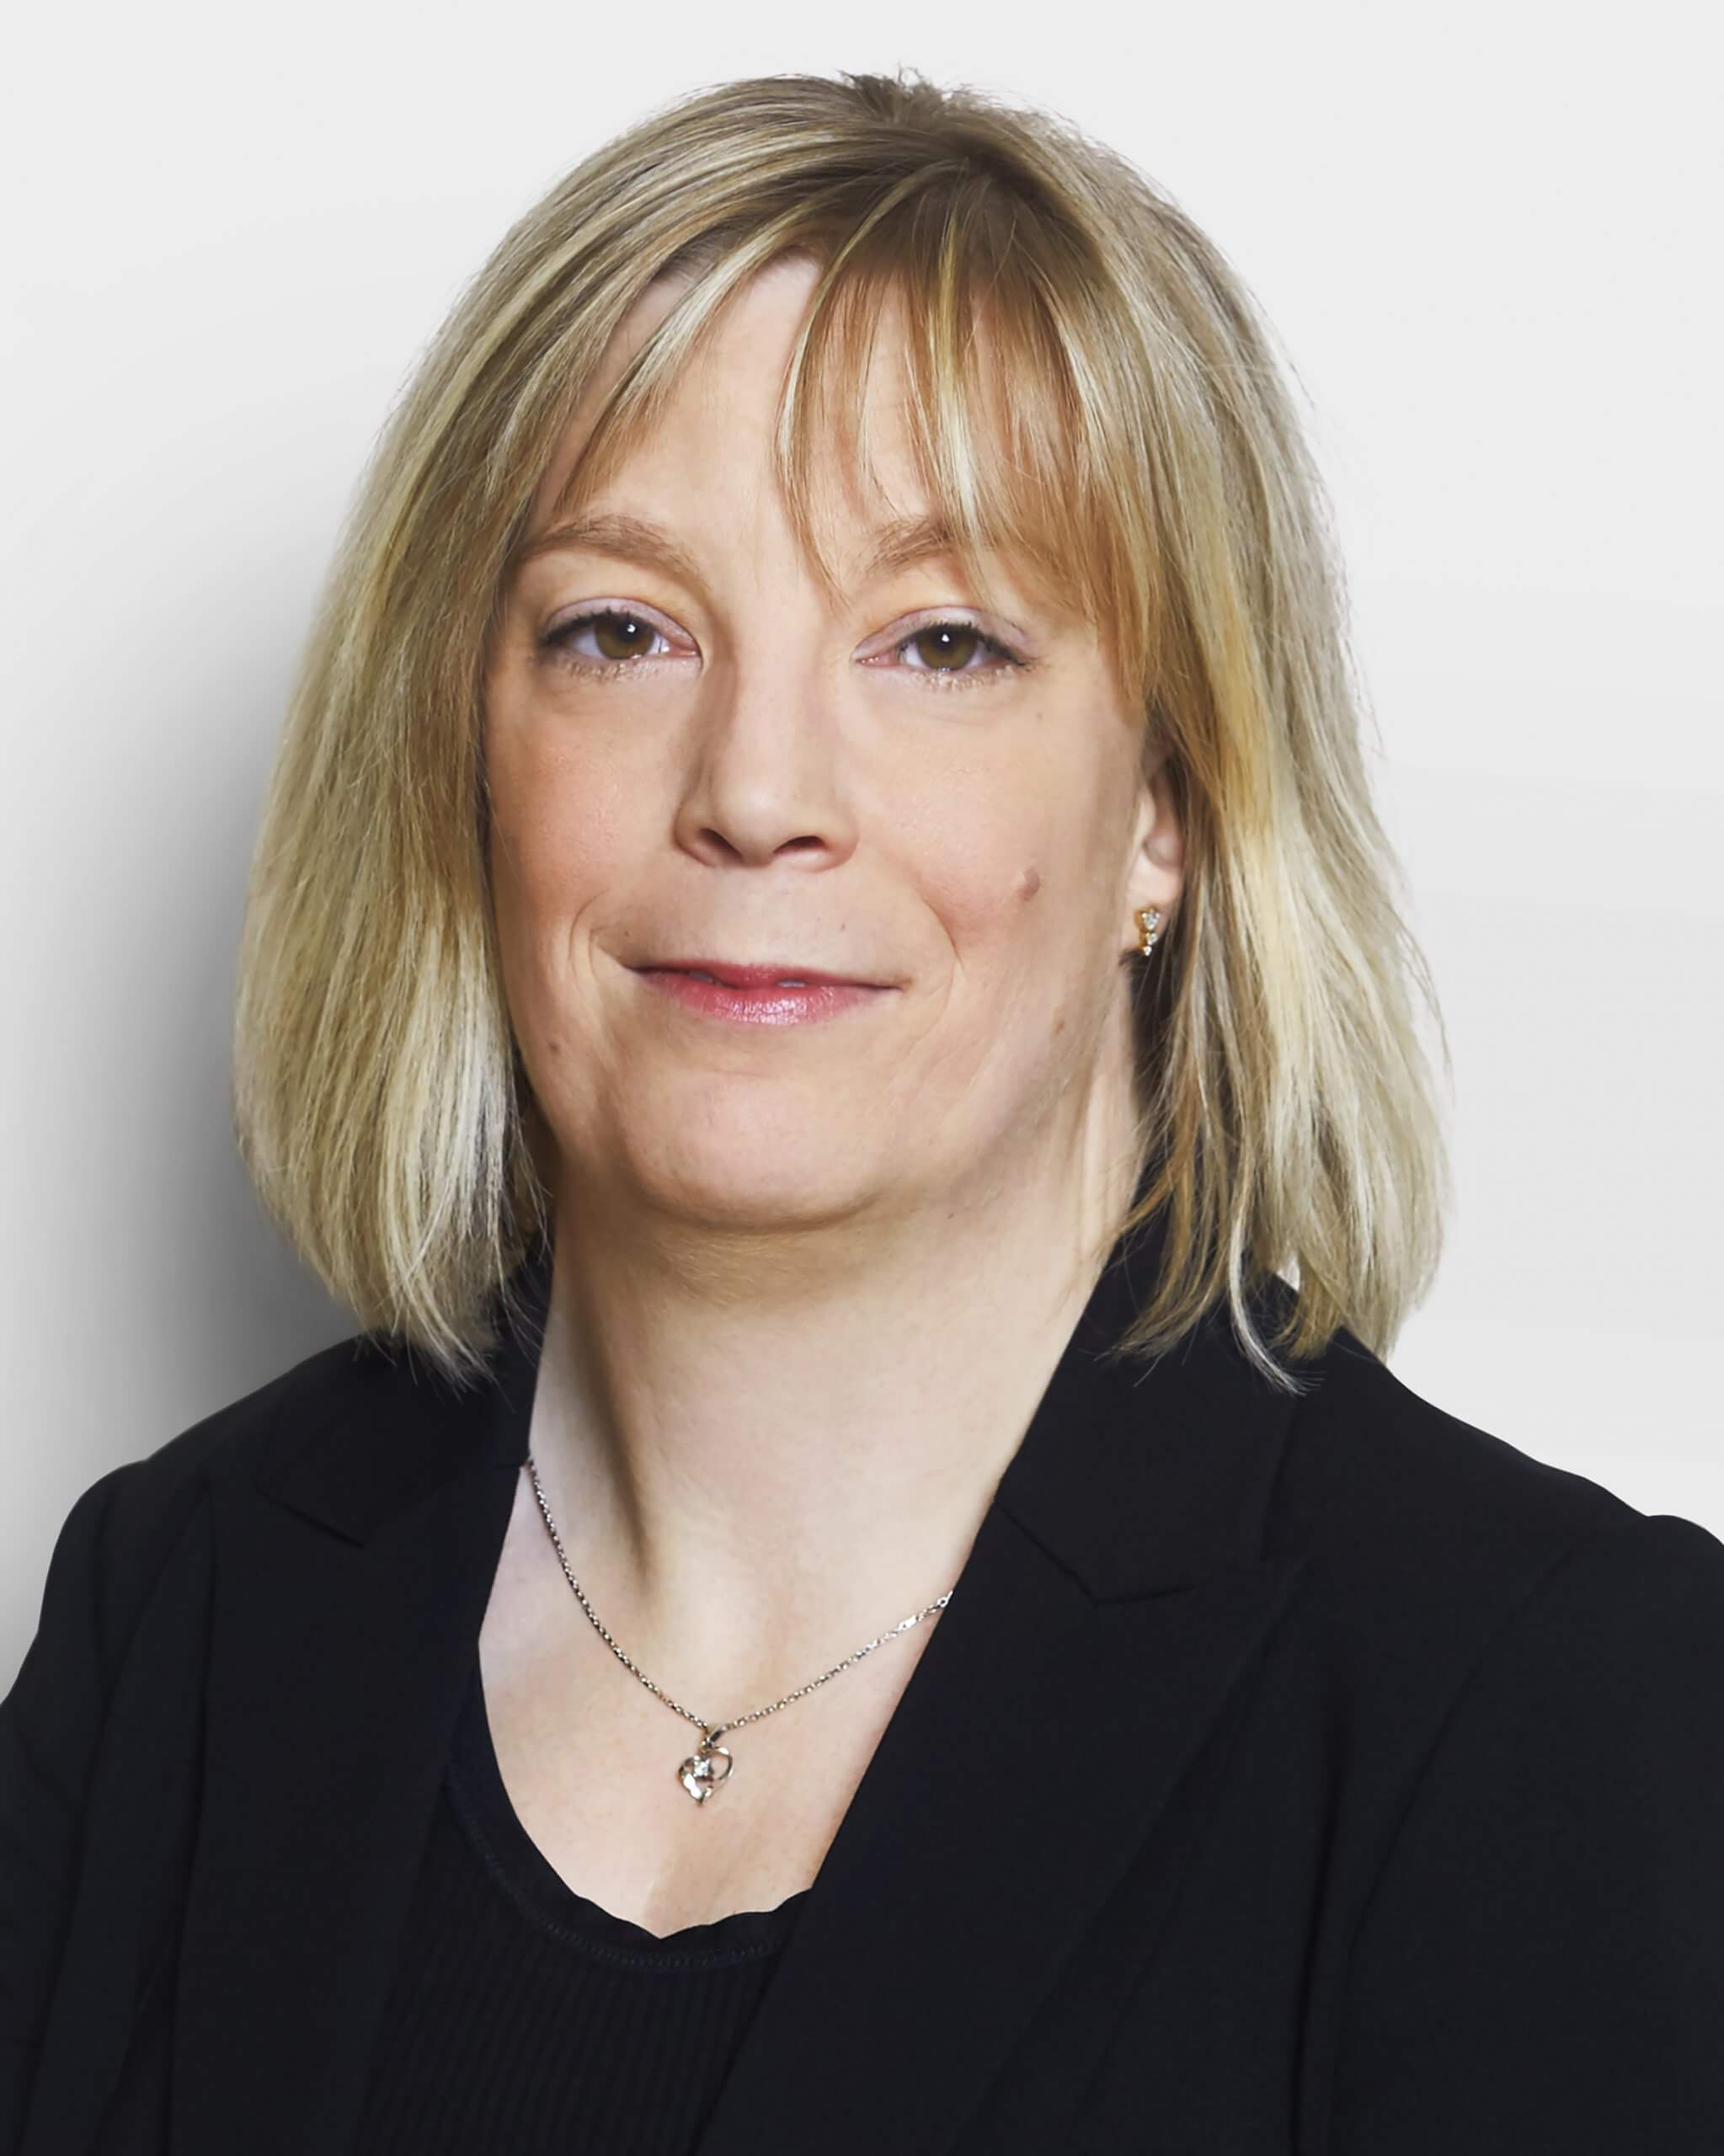 Katrine Tybjerg